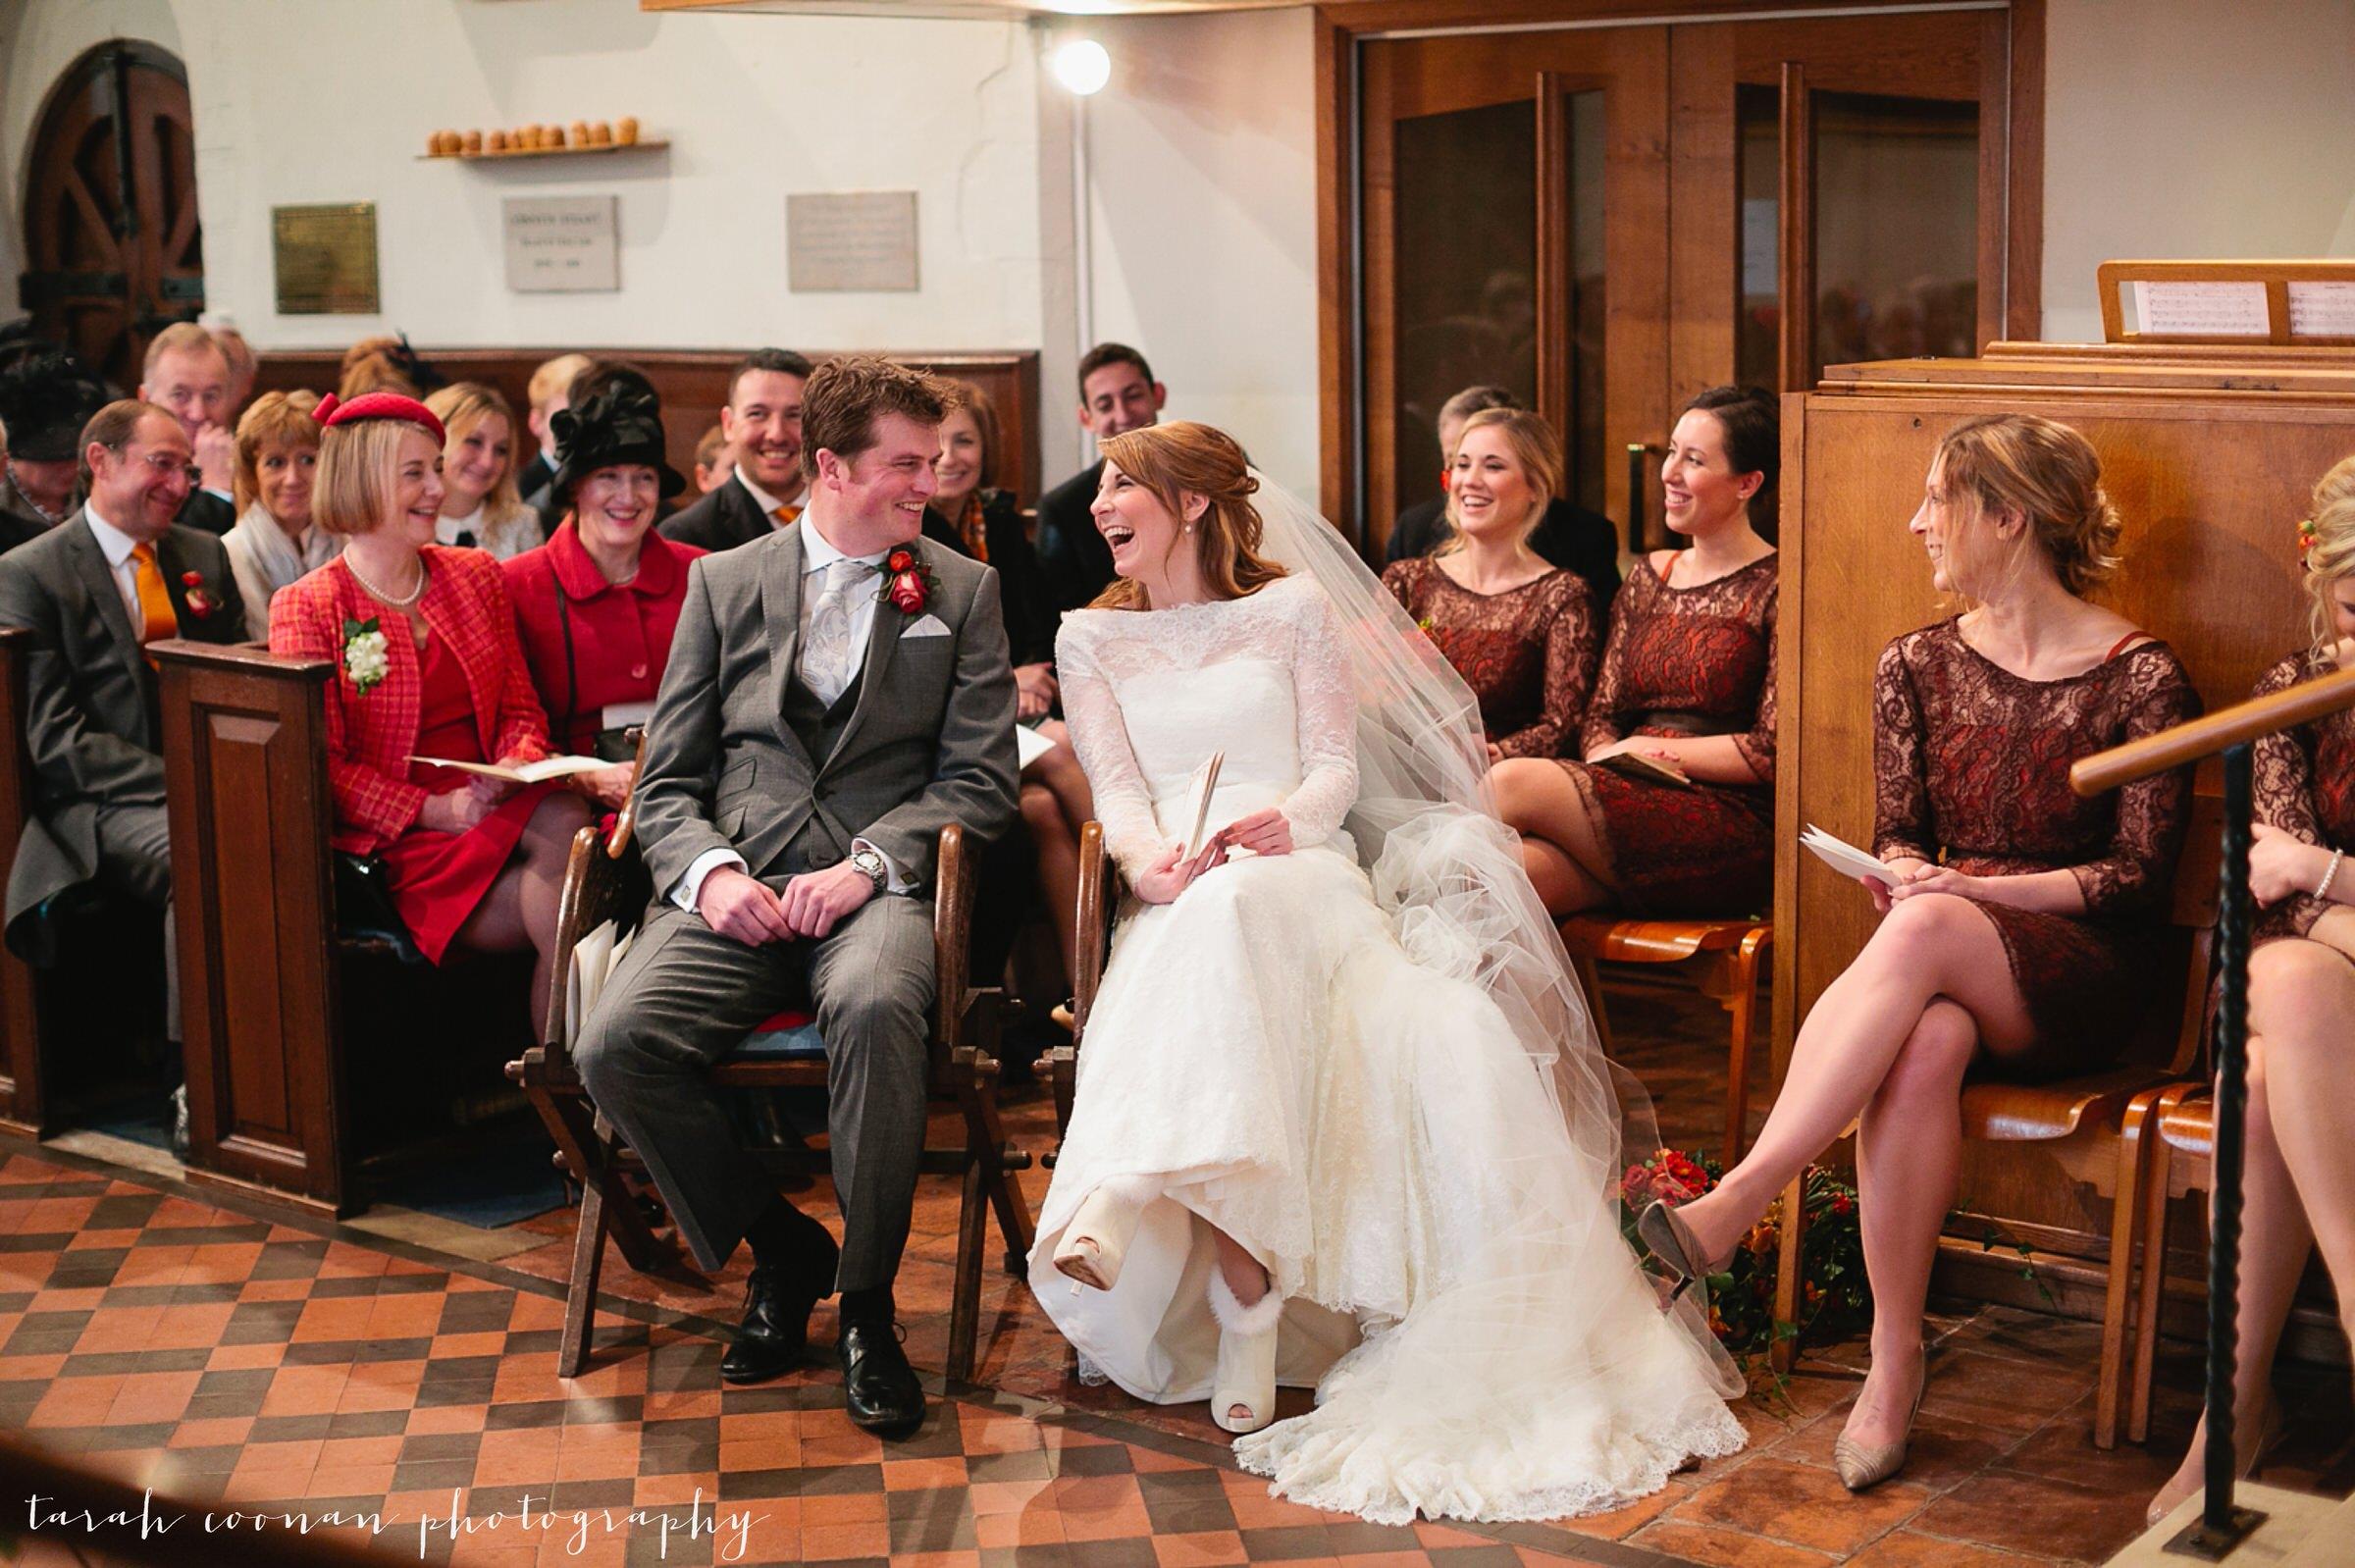 brighton-wedding-photographer19